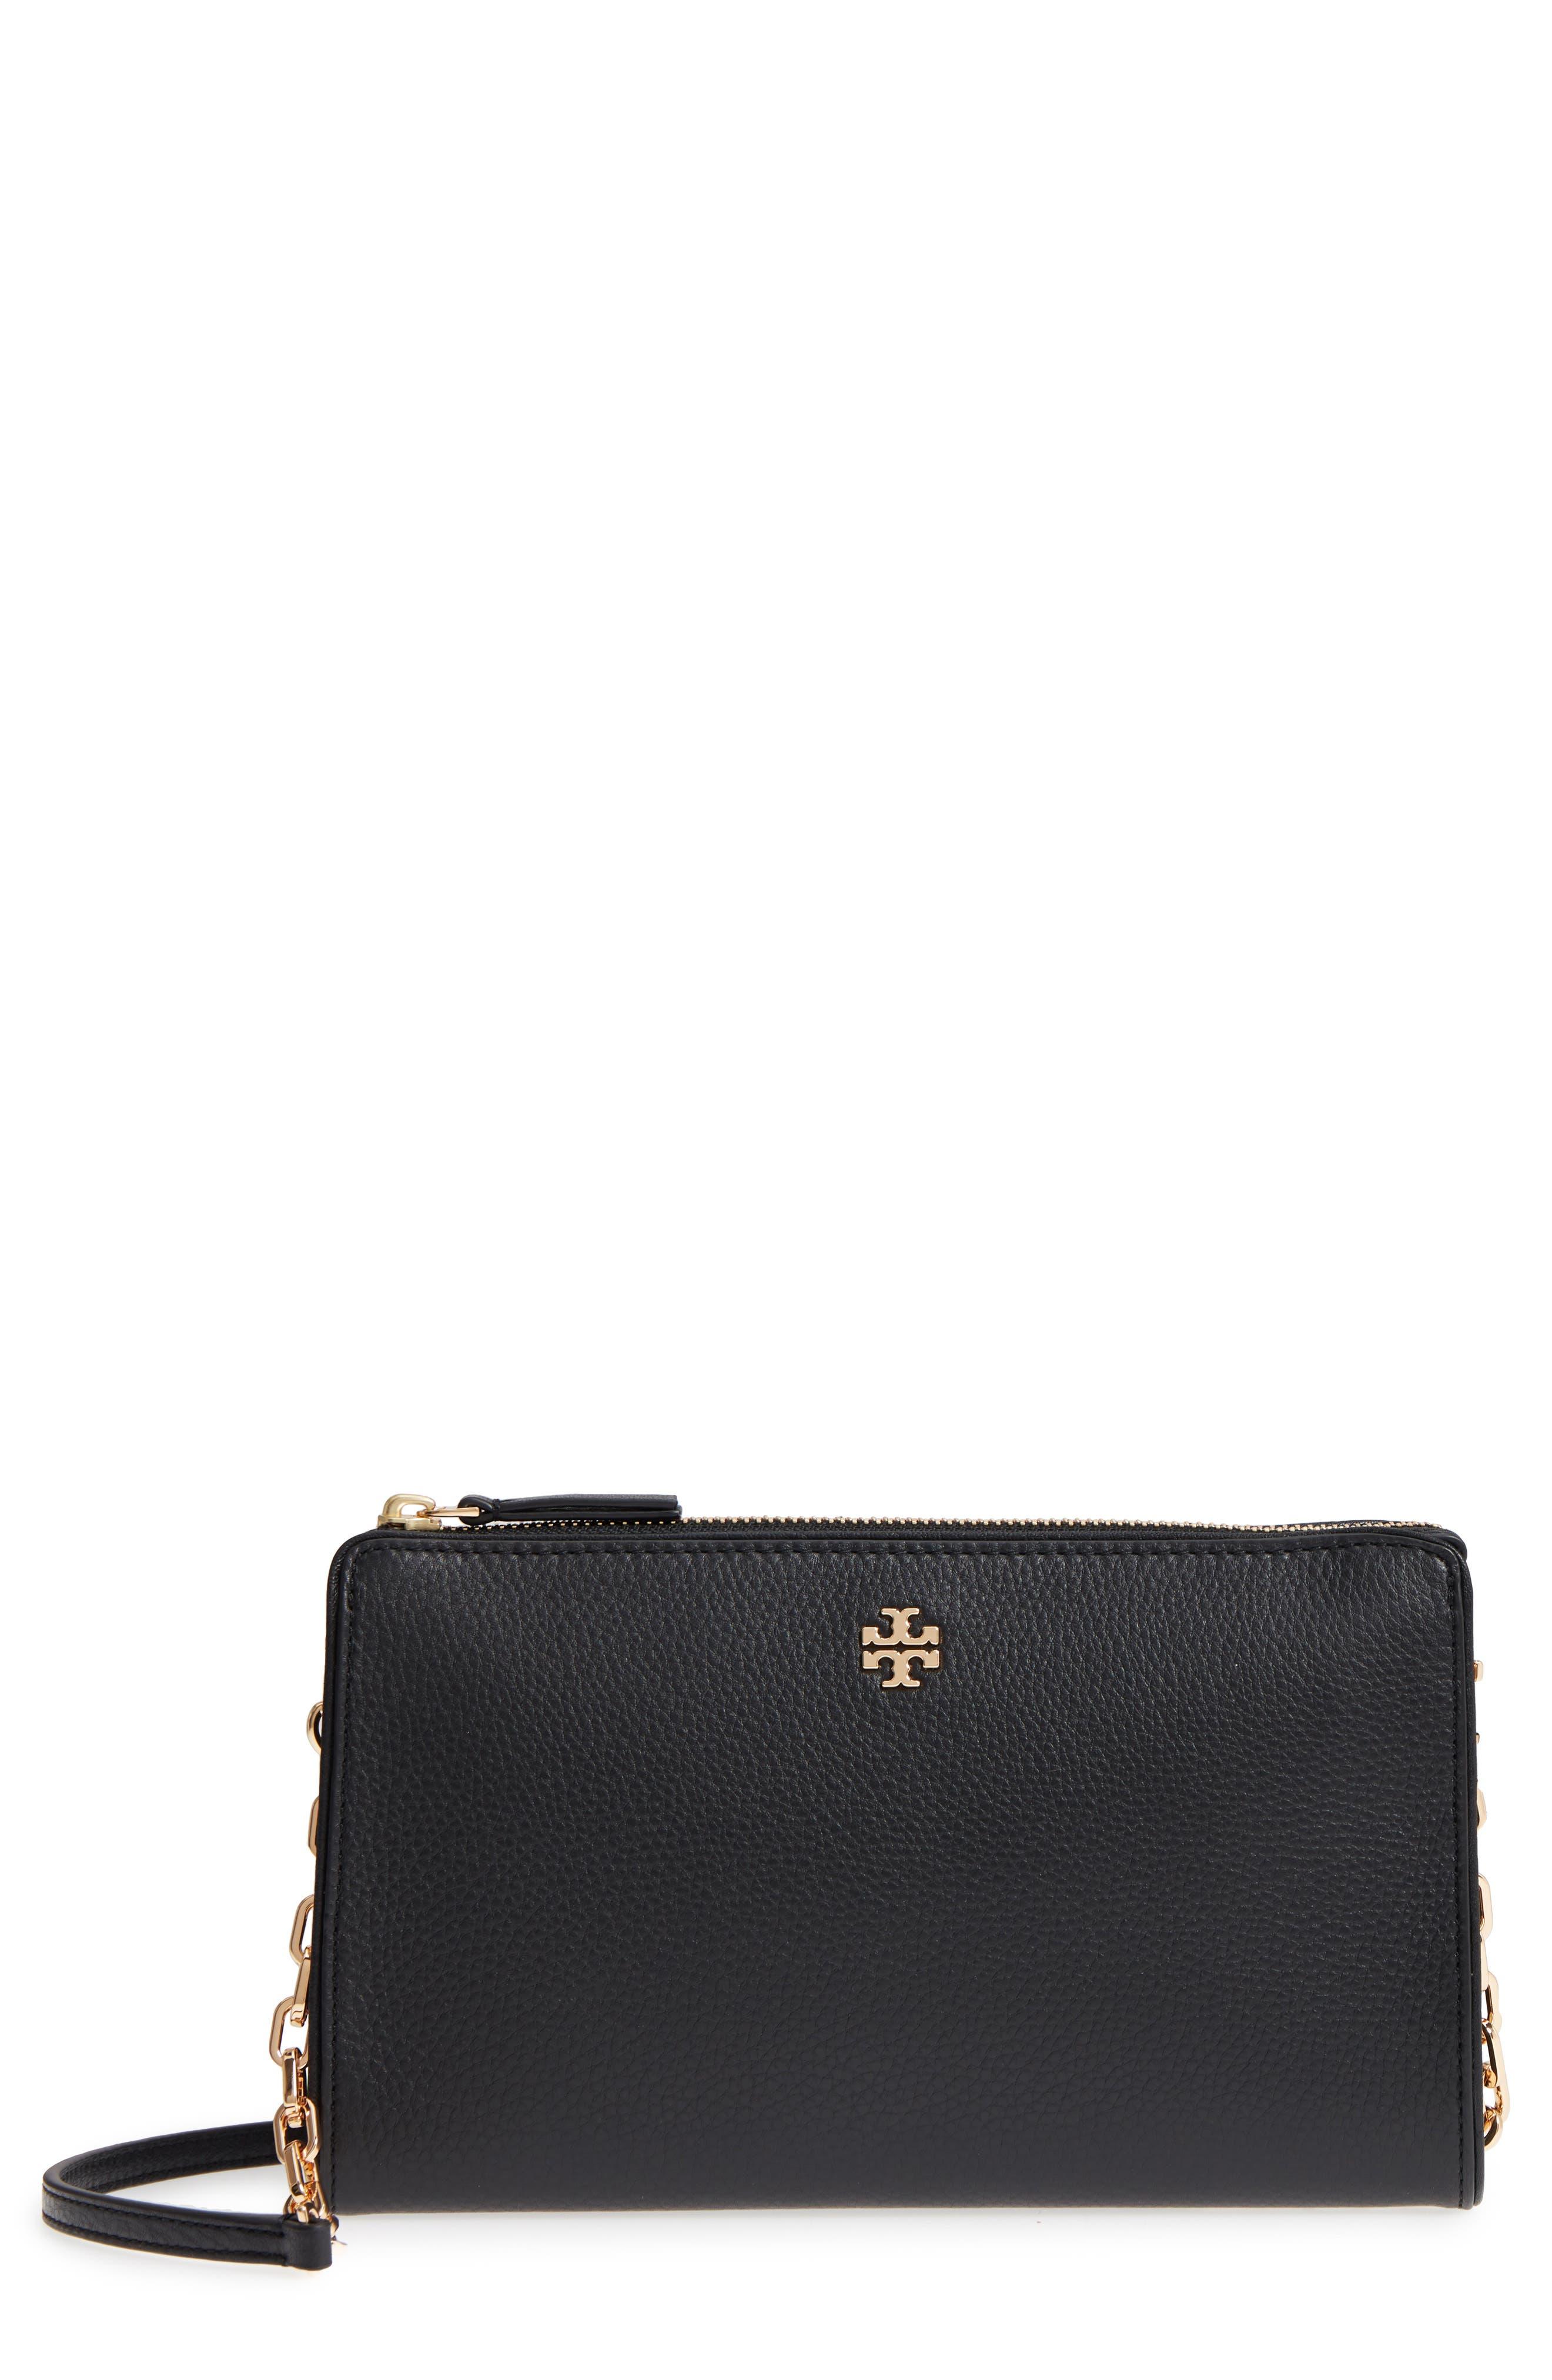 Marsden Leather Wallet Crossbody Bag,                         Main,                         color, Black